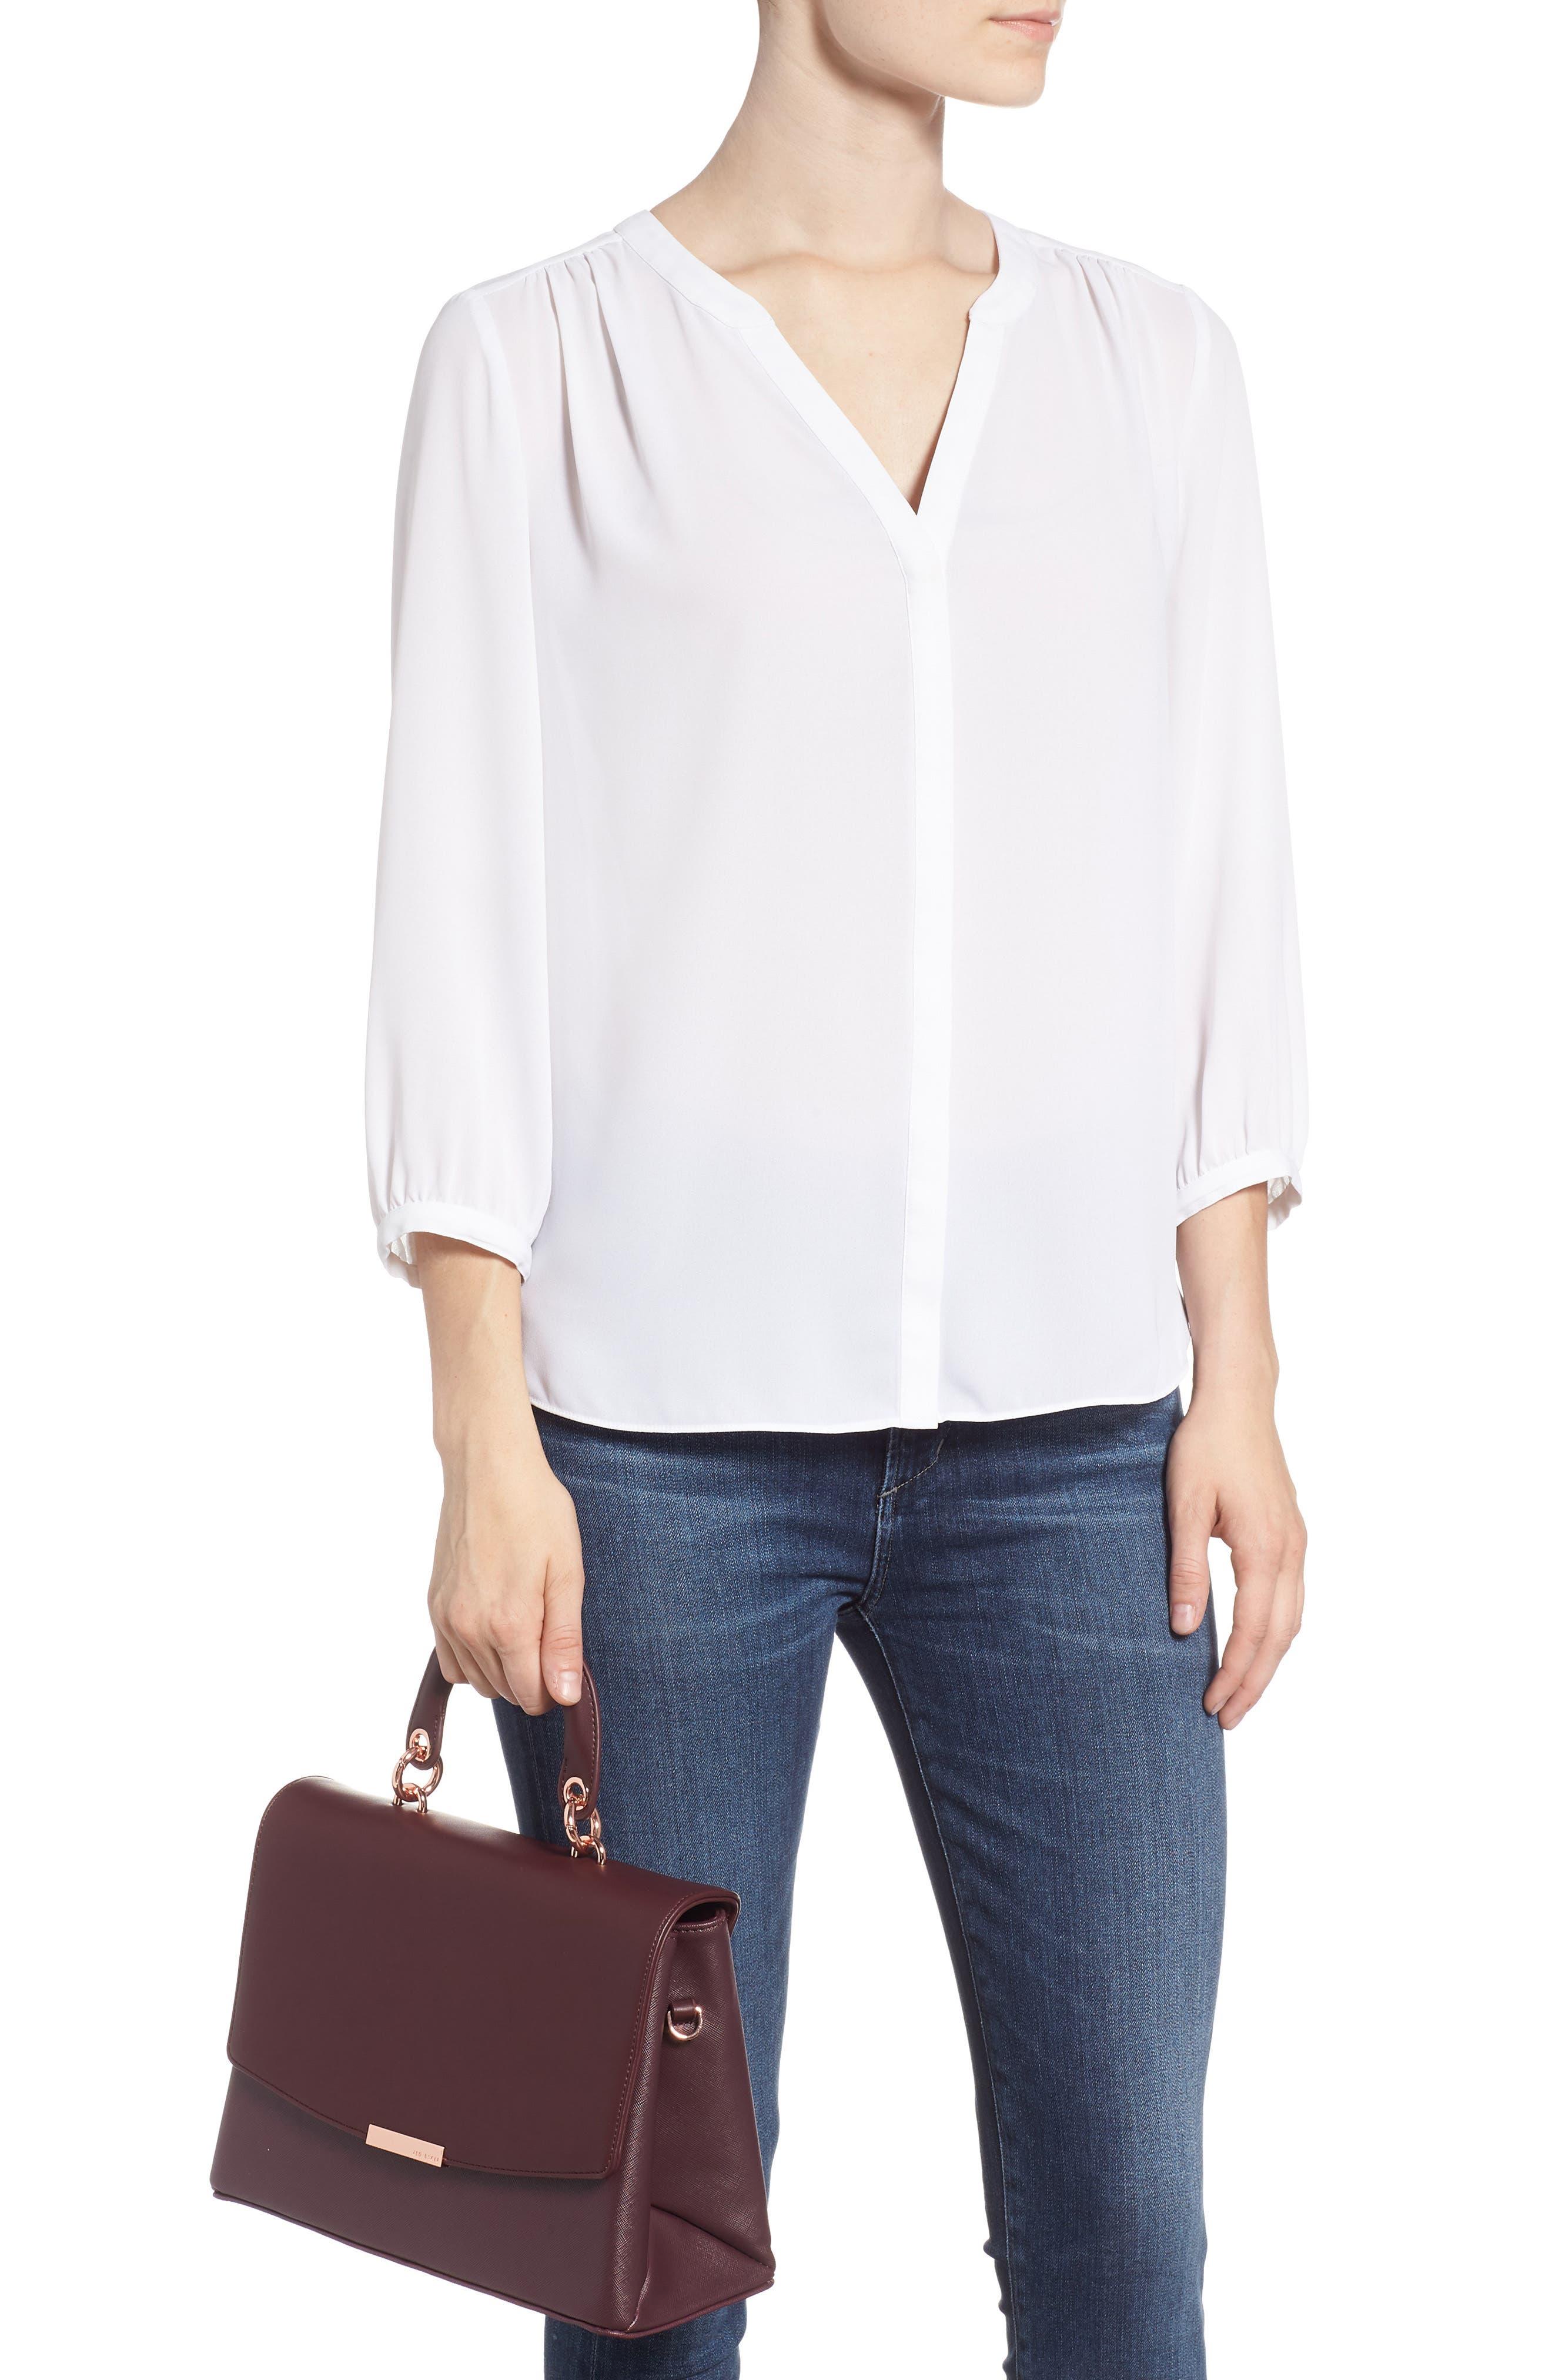 Keiira Lady Bag Faux Leather Top Handle Satchel,                             Alternate thumbnail 2, color,                             DEEP PURPLE